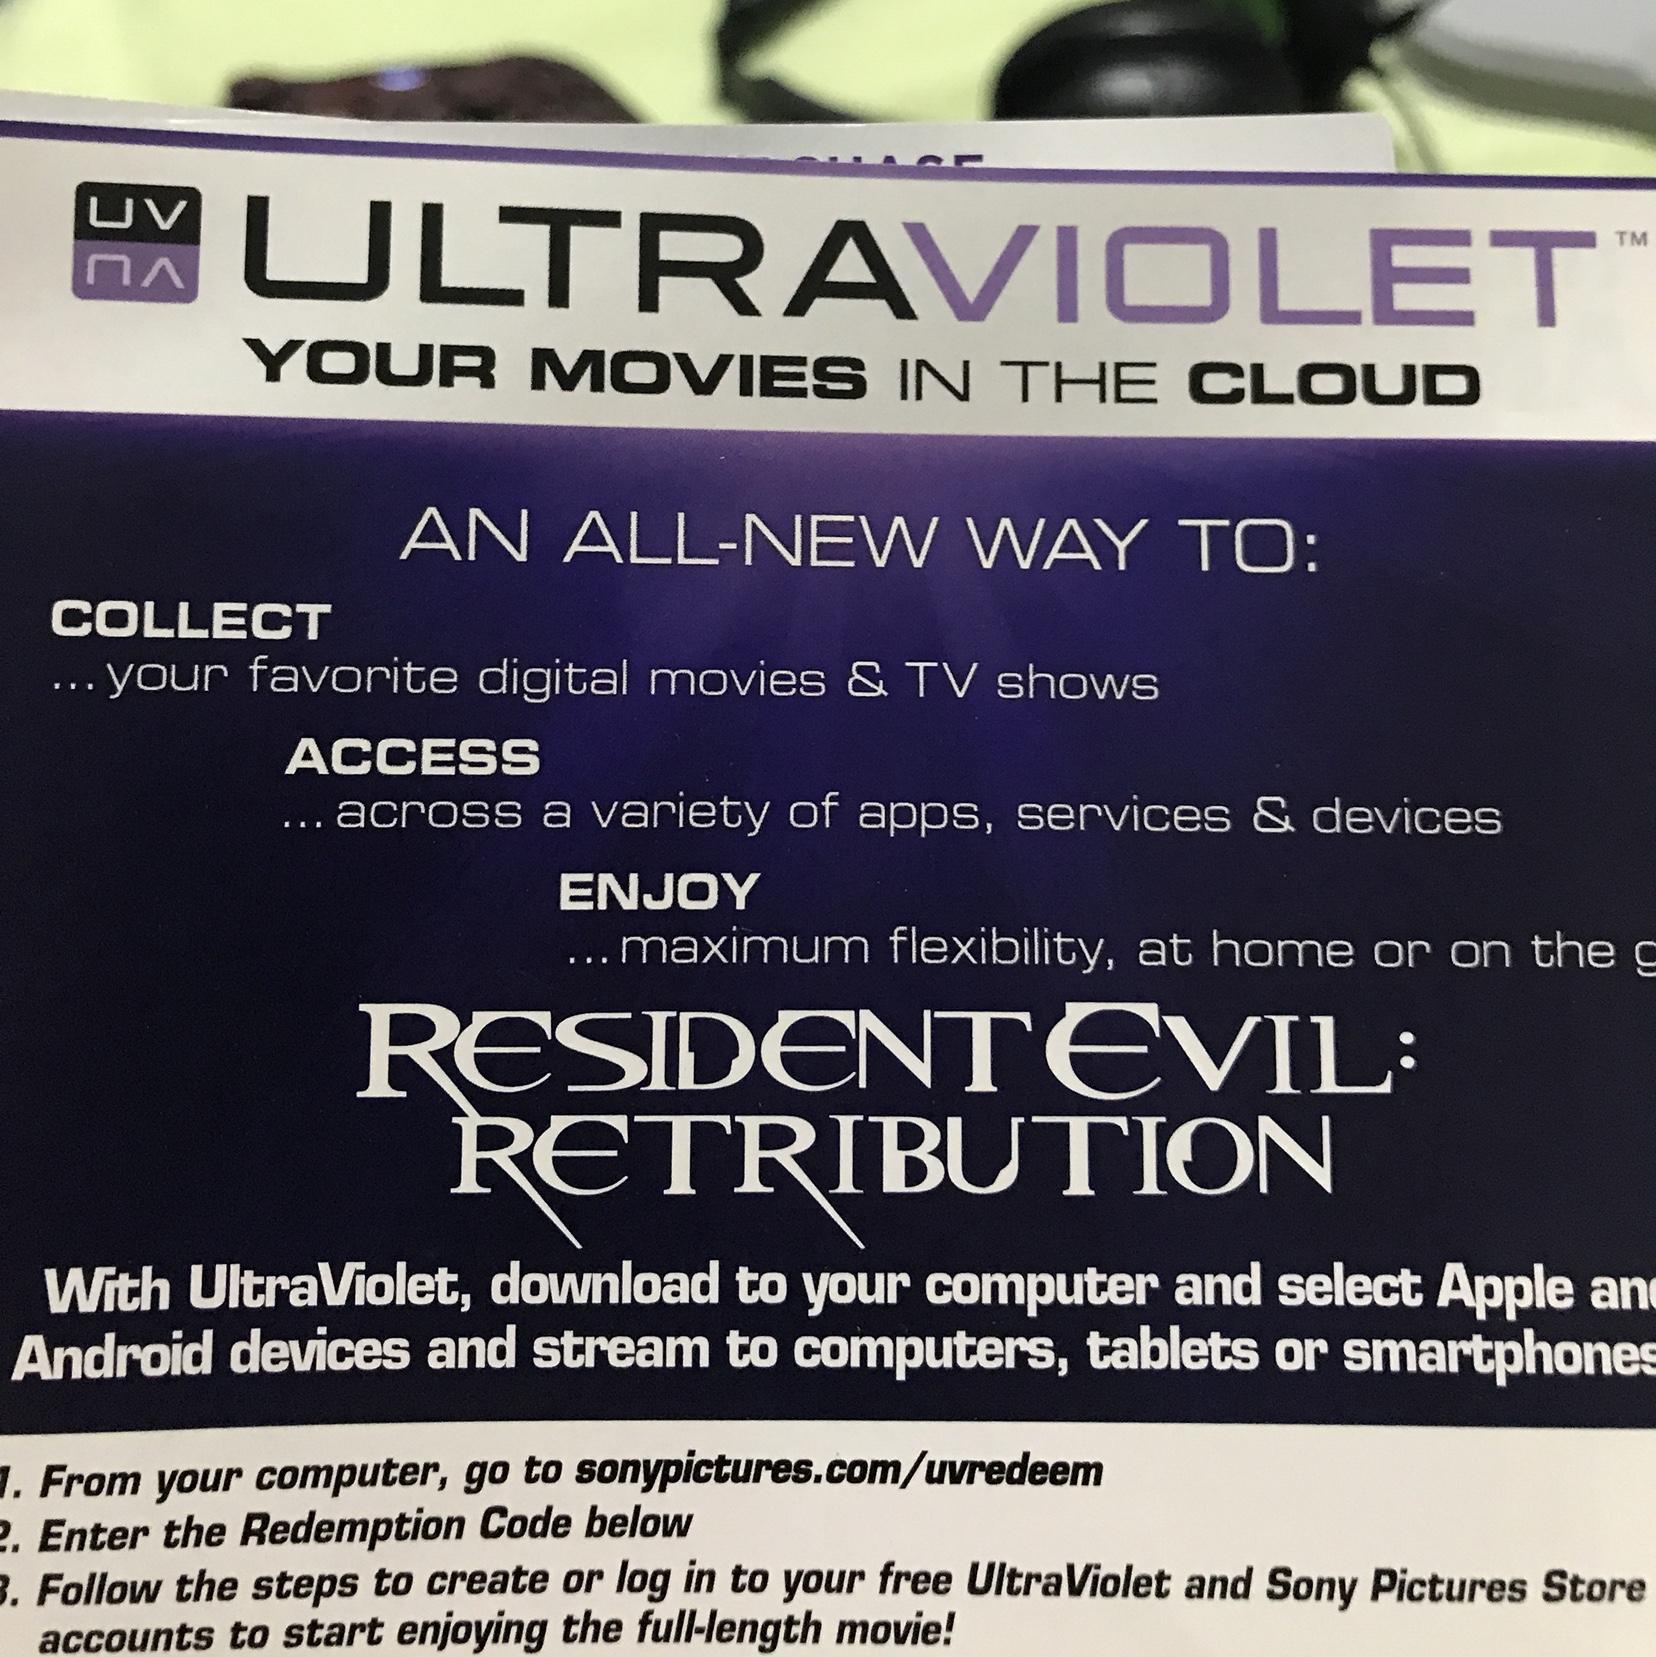 Resident Evil Retribution HD digital download UV Ultraviolet us only -  Digital Movies - Gameflip